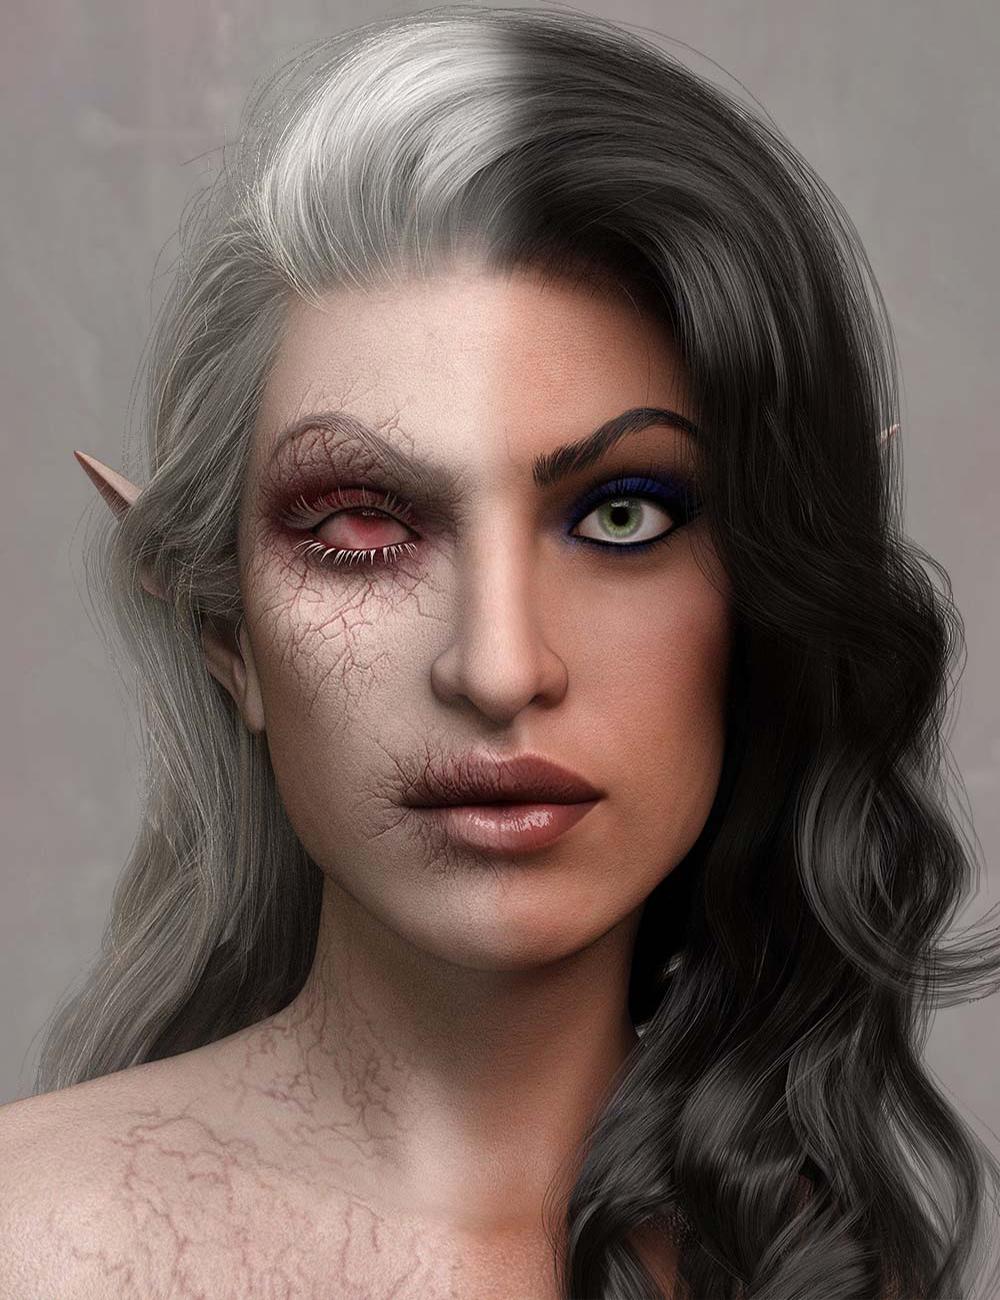 TM Onyx for Genesis 8.1 Female by: TwiztedMetal, 3D Models by Daz 3D